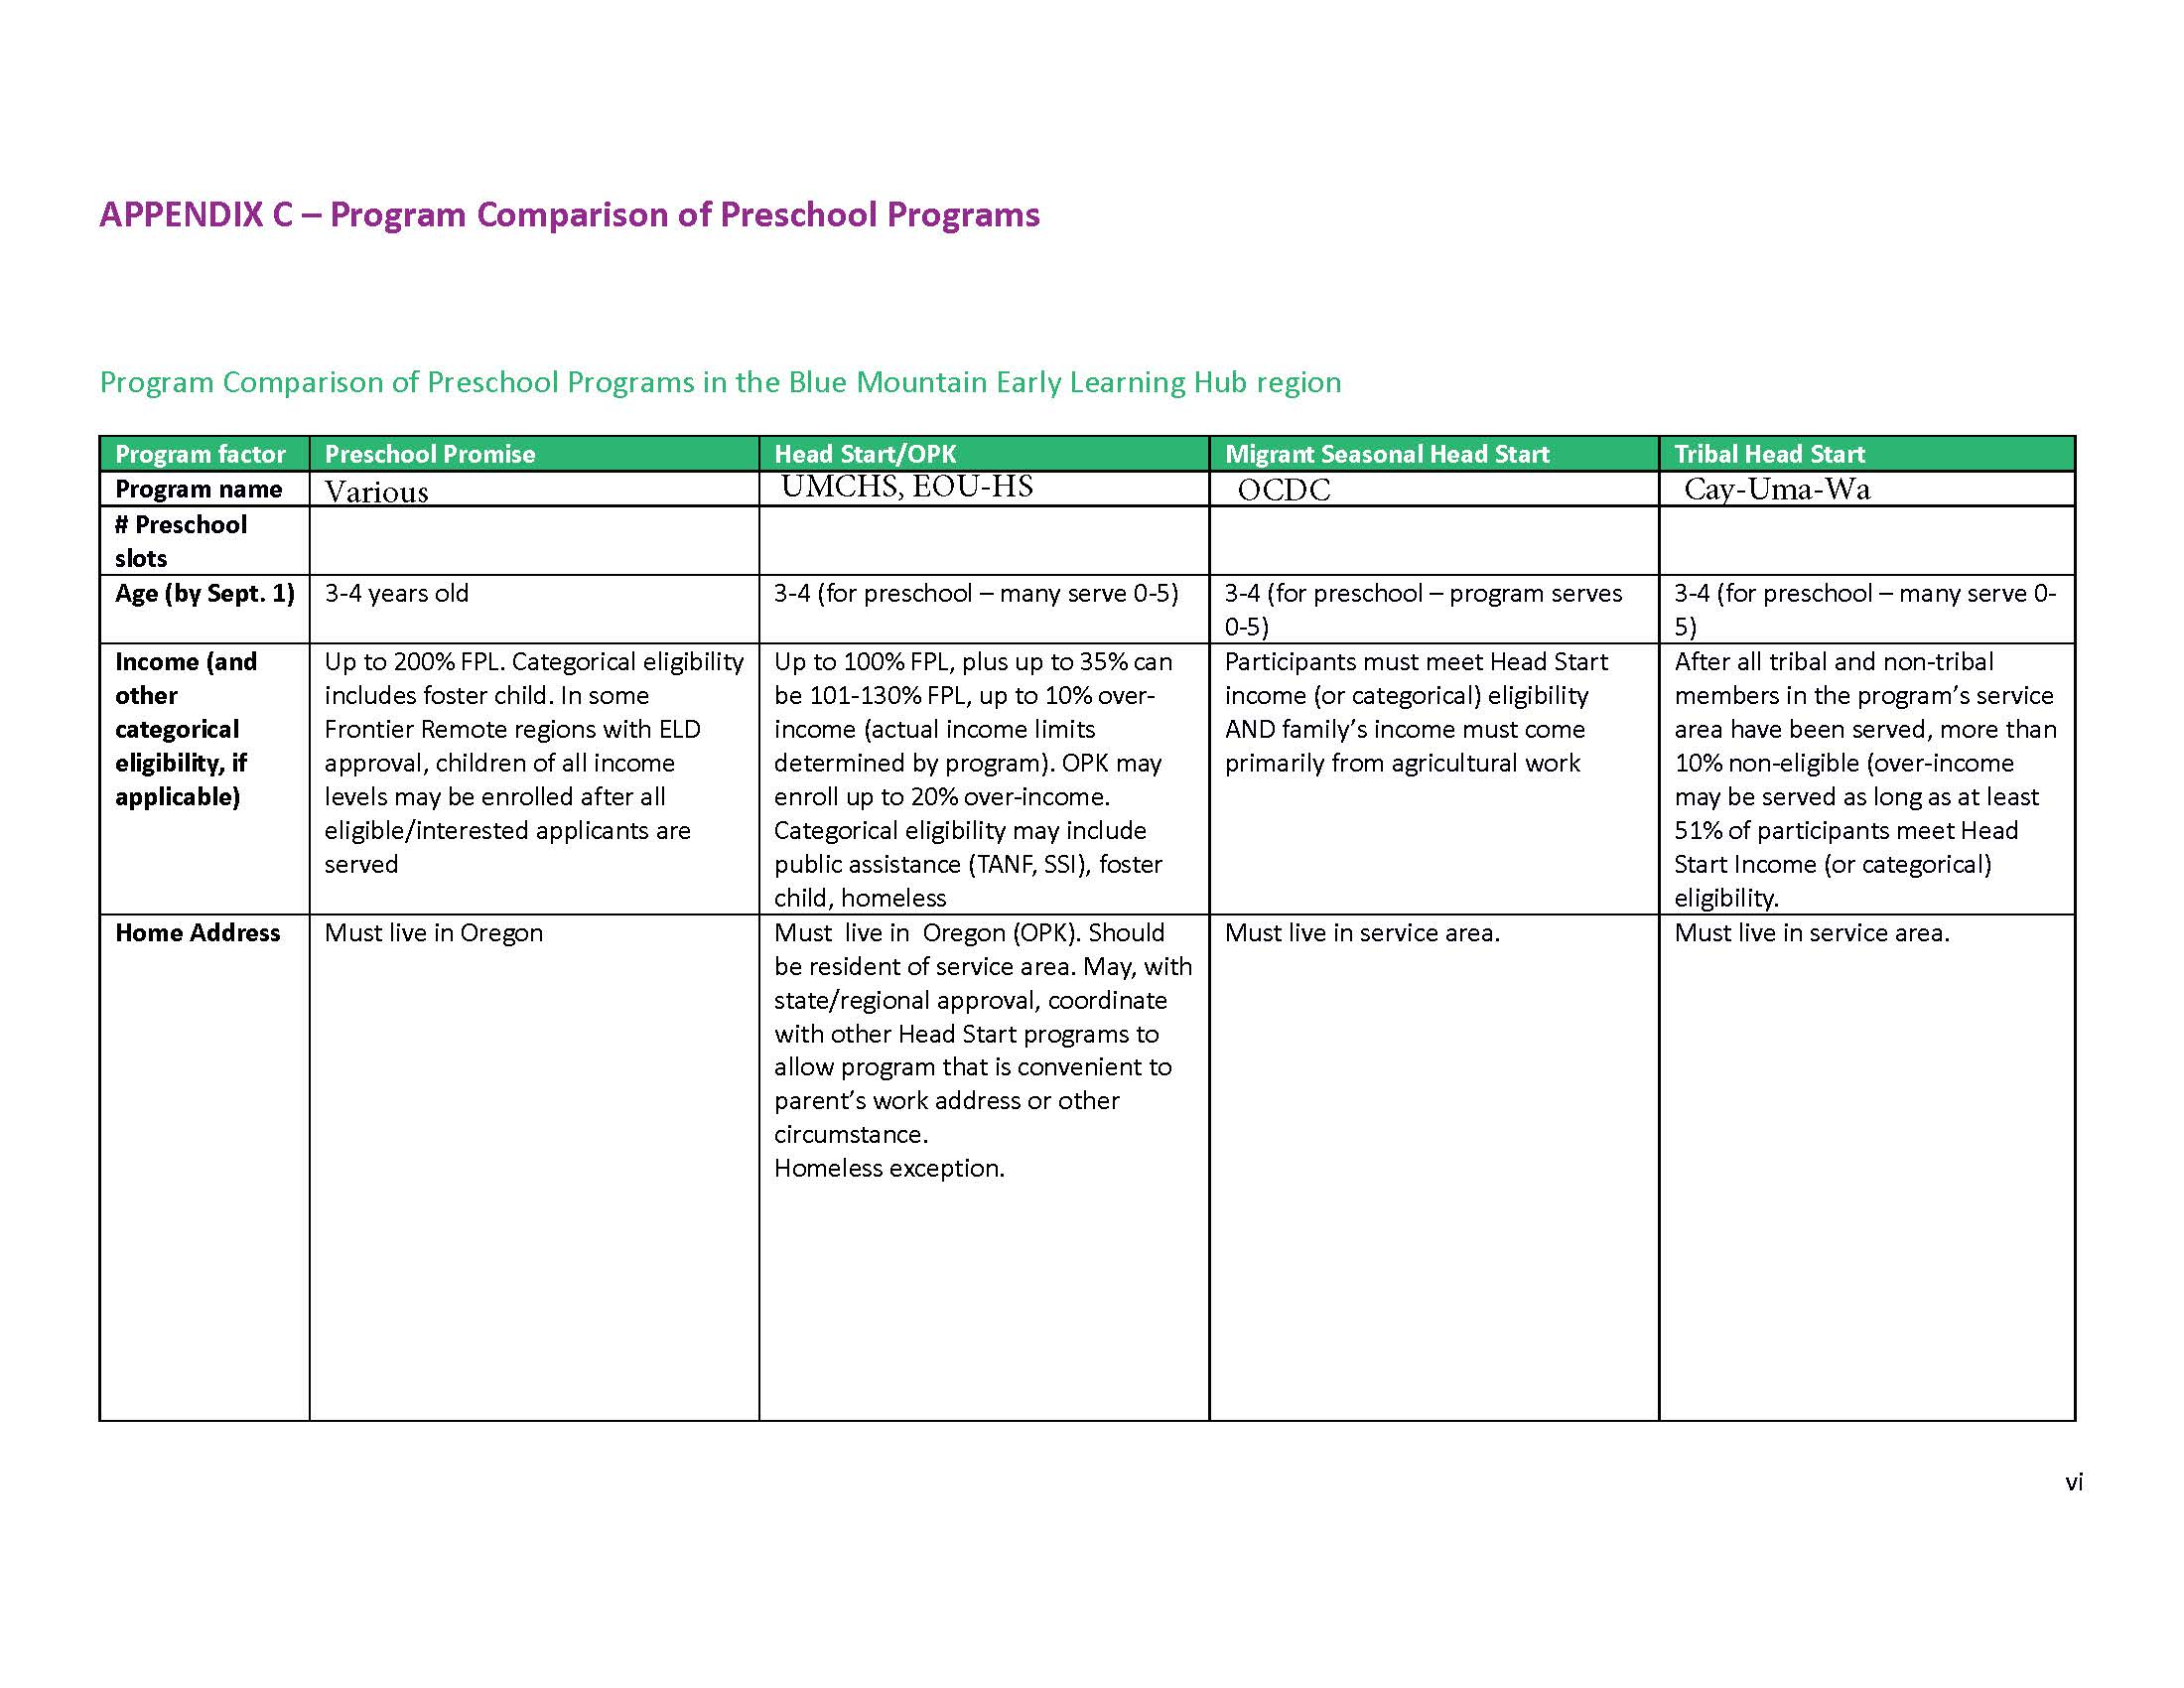 Preschool Promise-Head Start comparison